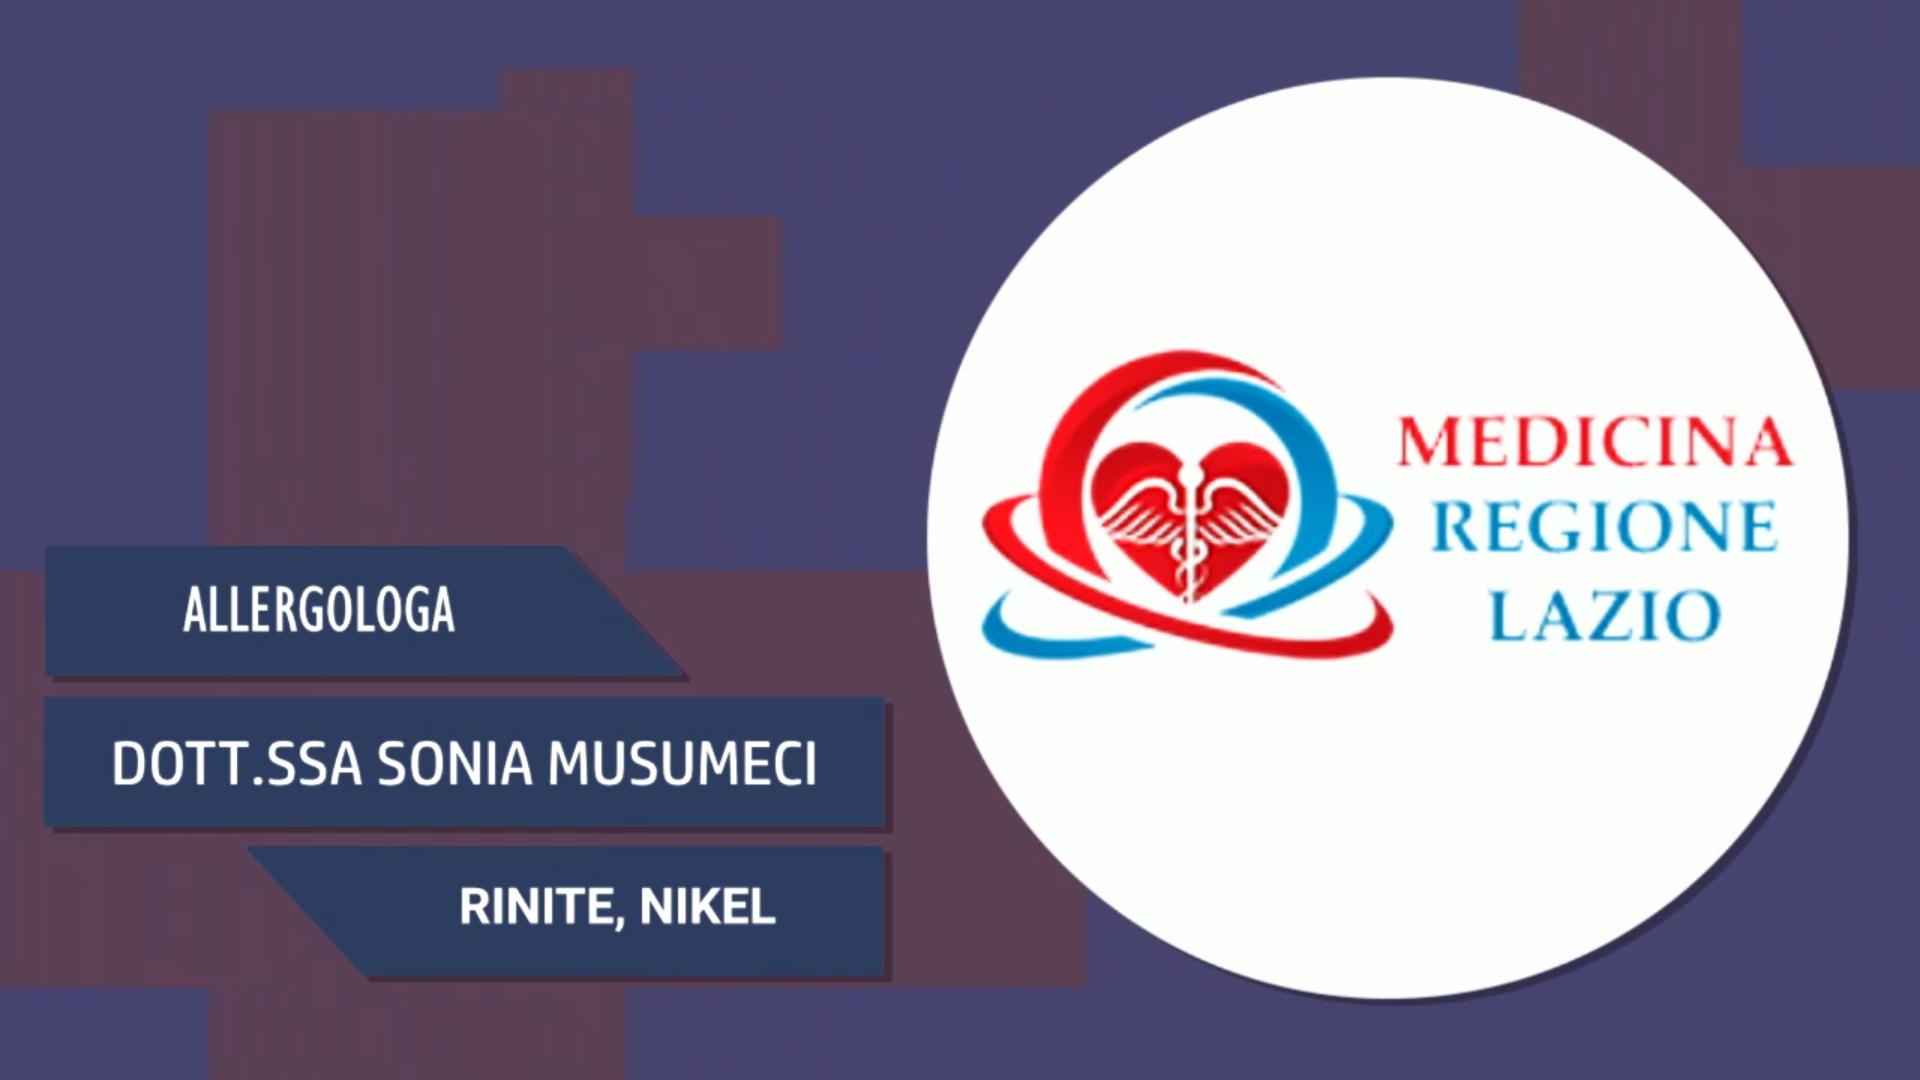 Intervista alla Dott.ssa Sonia Musumeci – Rinite, Nikel